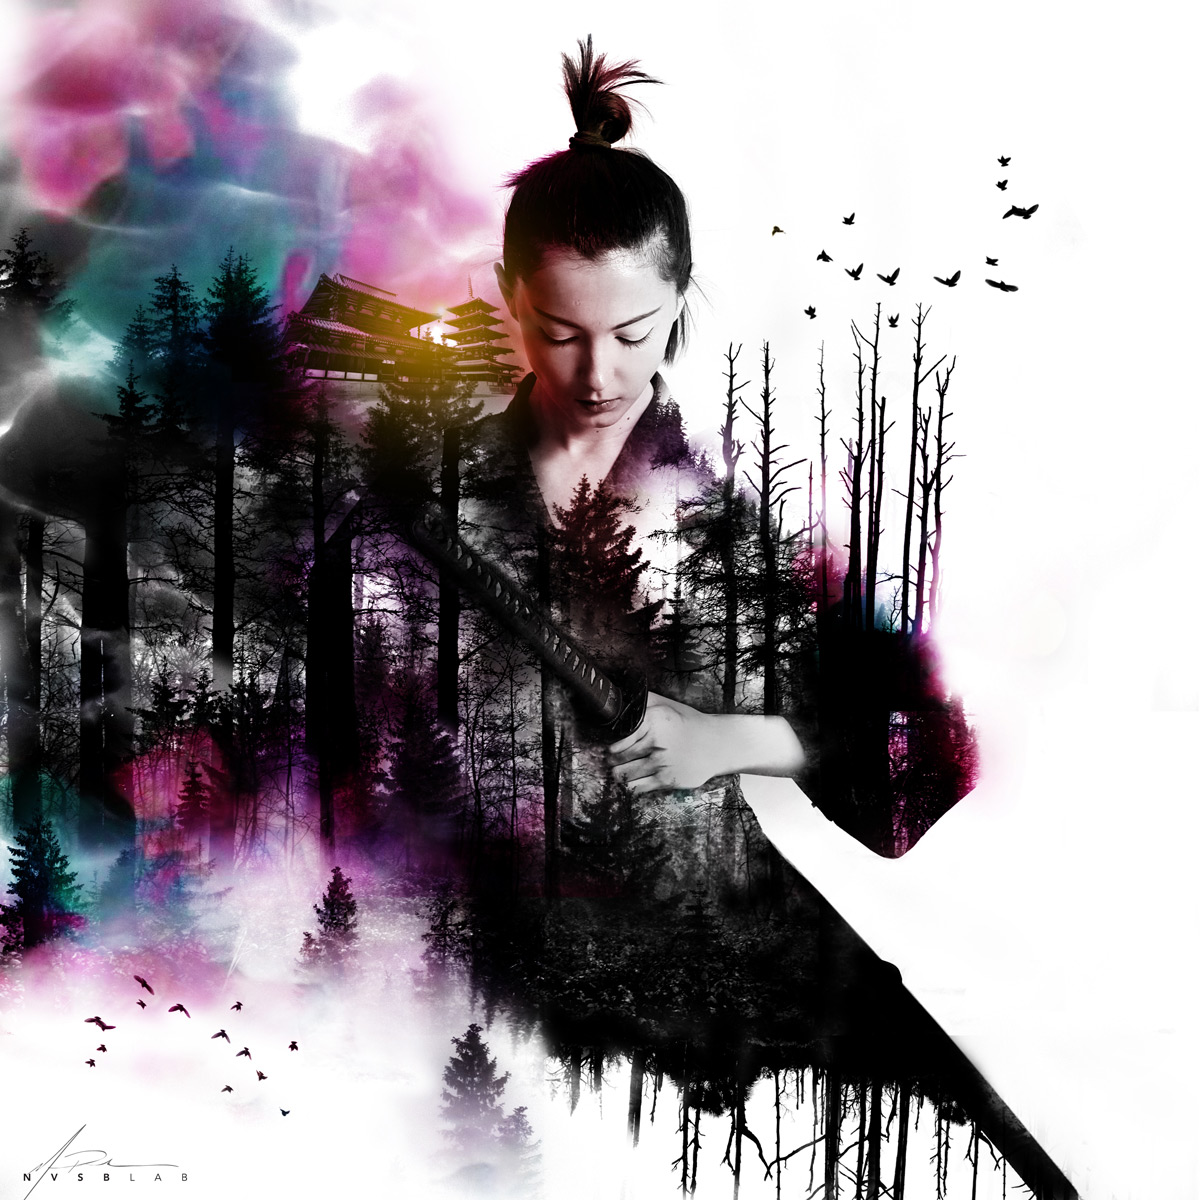 Digital Artwork by Mark Penacerrada